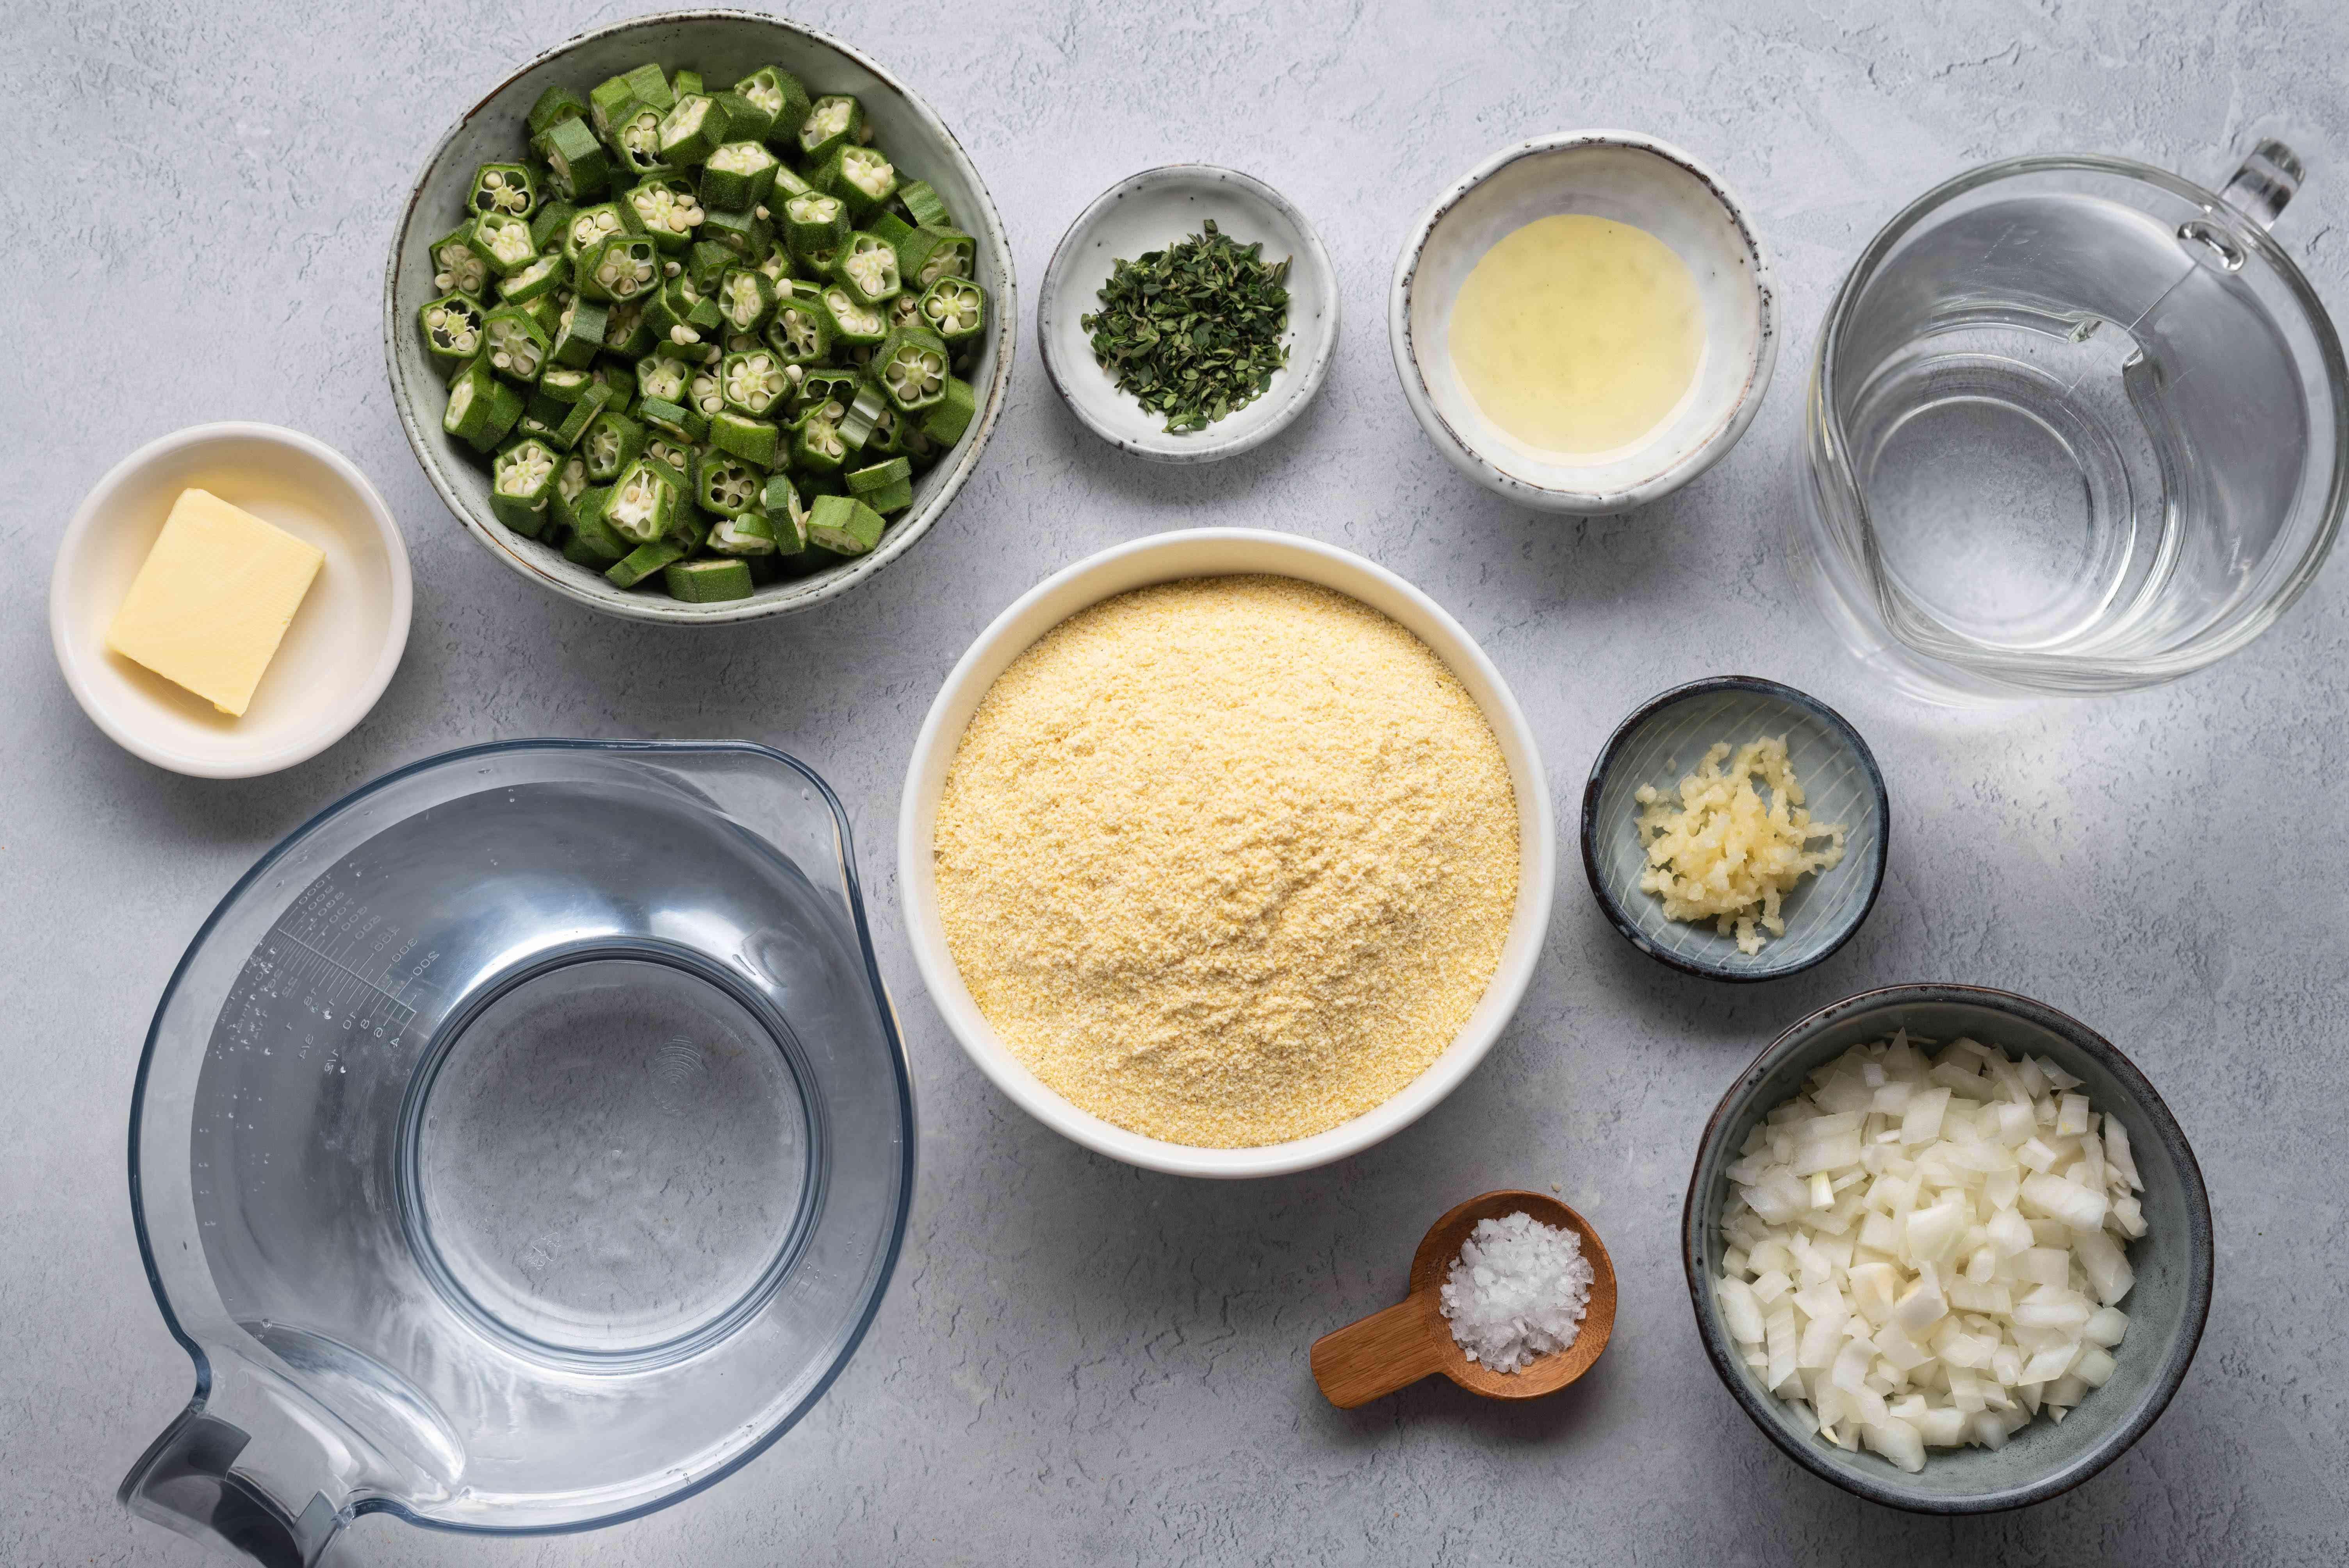 Caribbean Cornmeal Cou-Cou ingredients